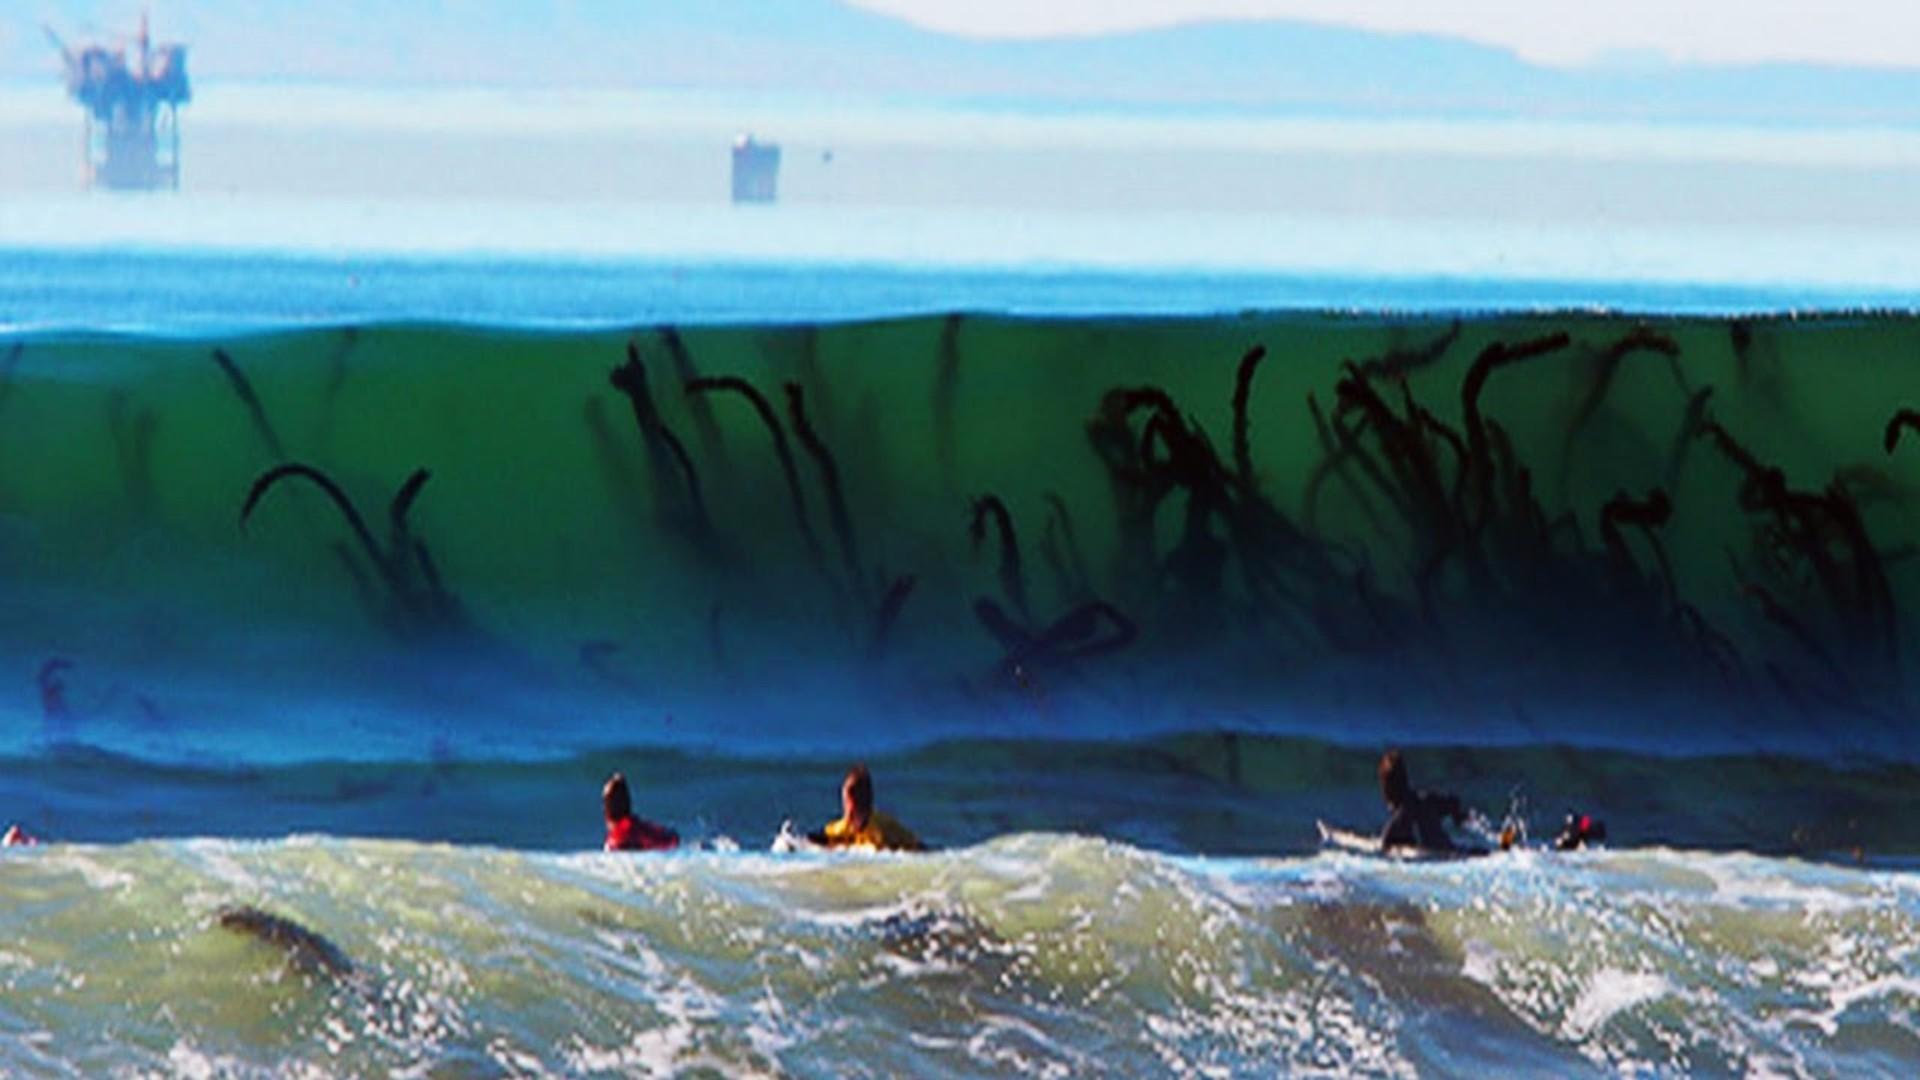 Surfing HD Wallpaper